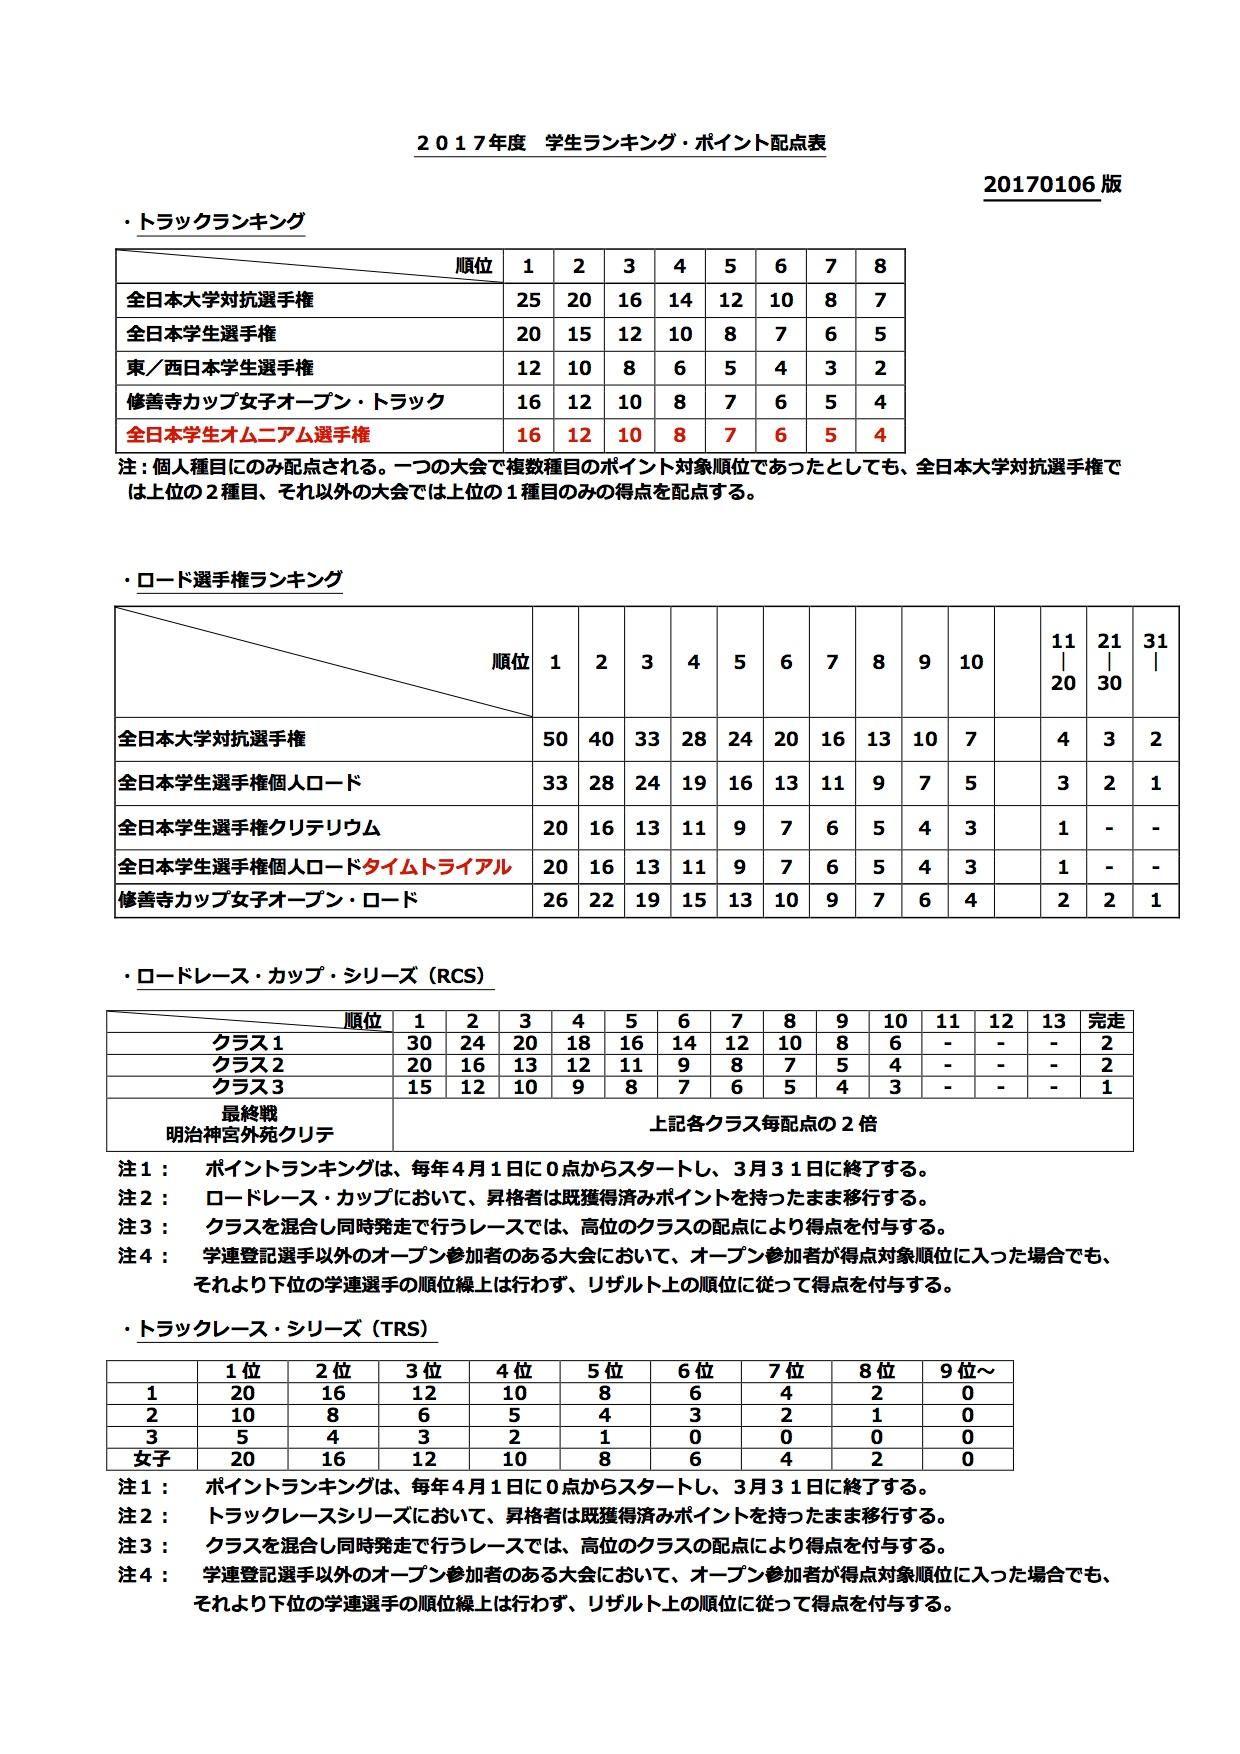 17sankakijyun_daihyoshisin170111_02